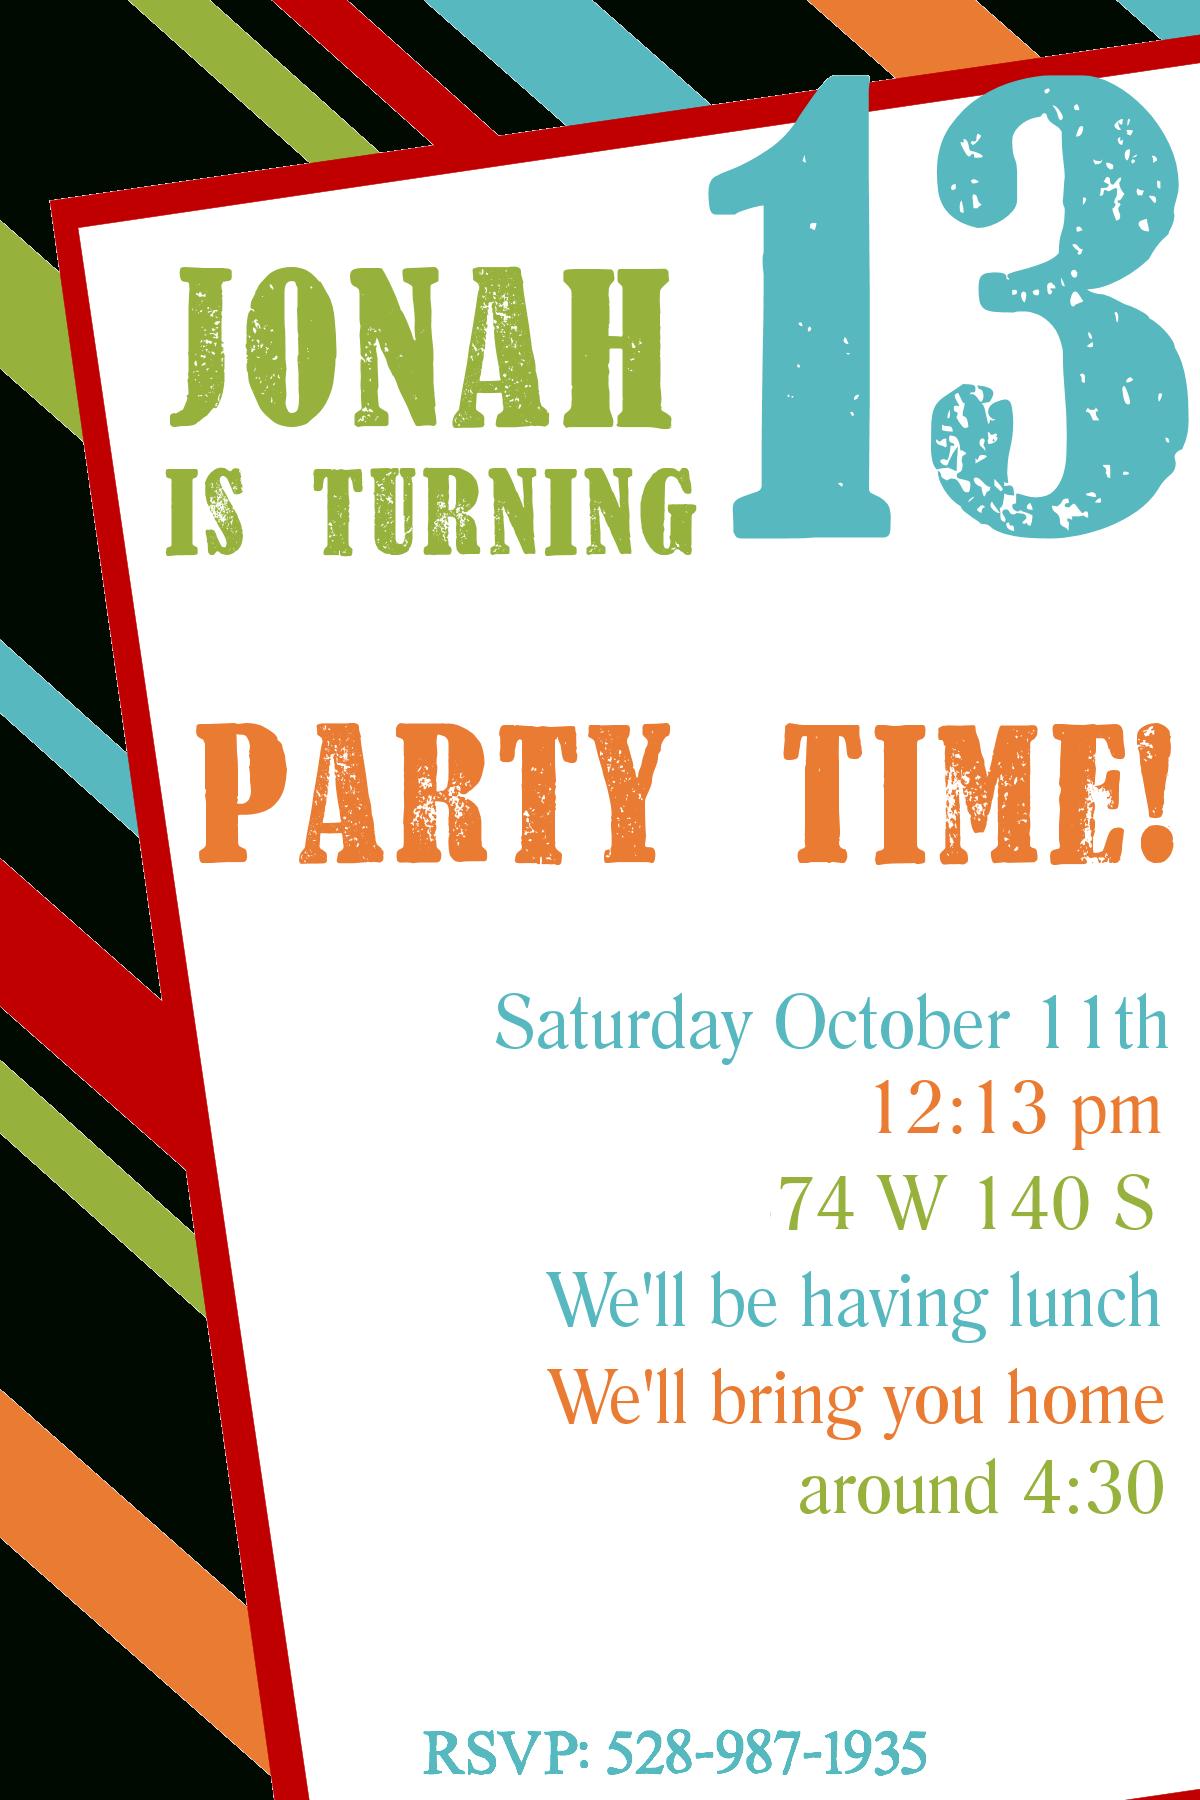 Free Printable Birthday Invitation Templates   Printables   Free - Free Printable Birthday Party Invitations With Photo